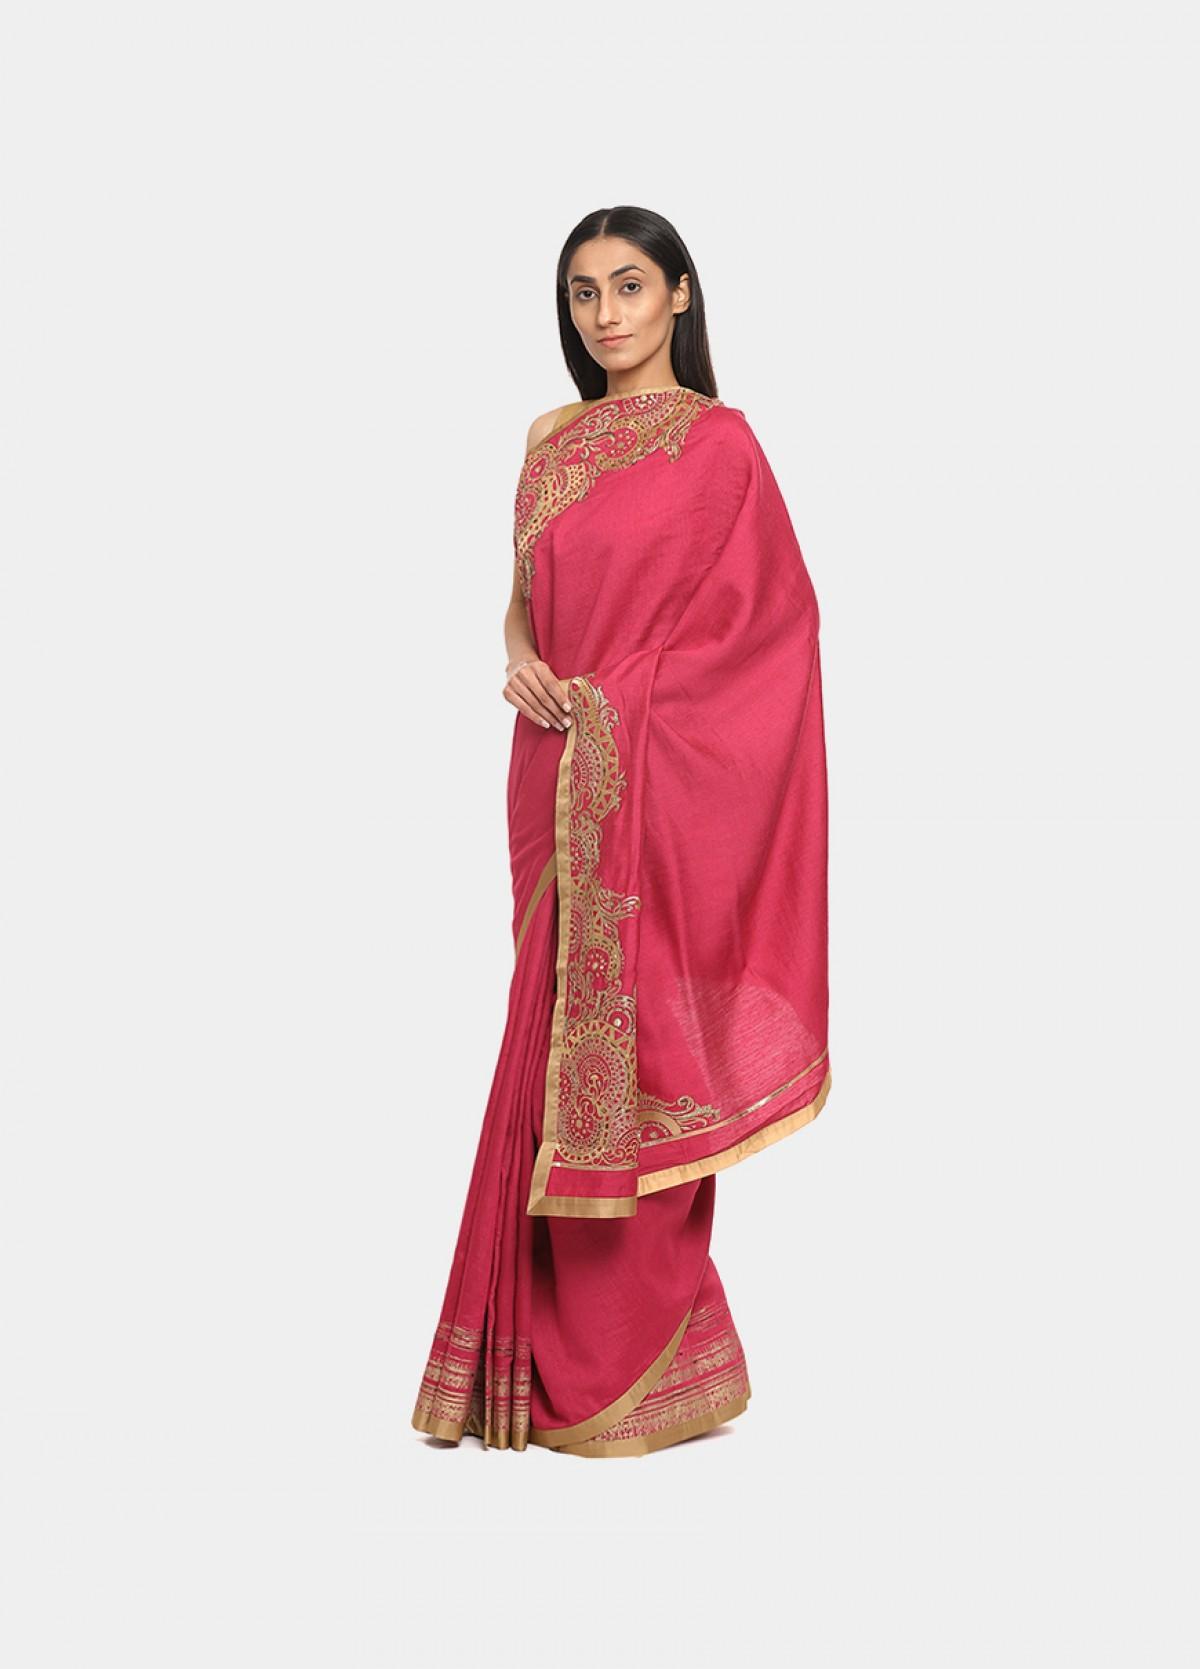 The Silk Pink Embroidered Sari